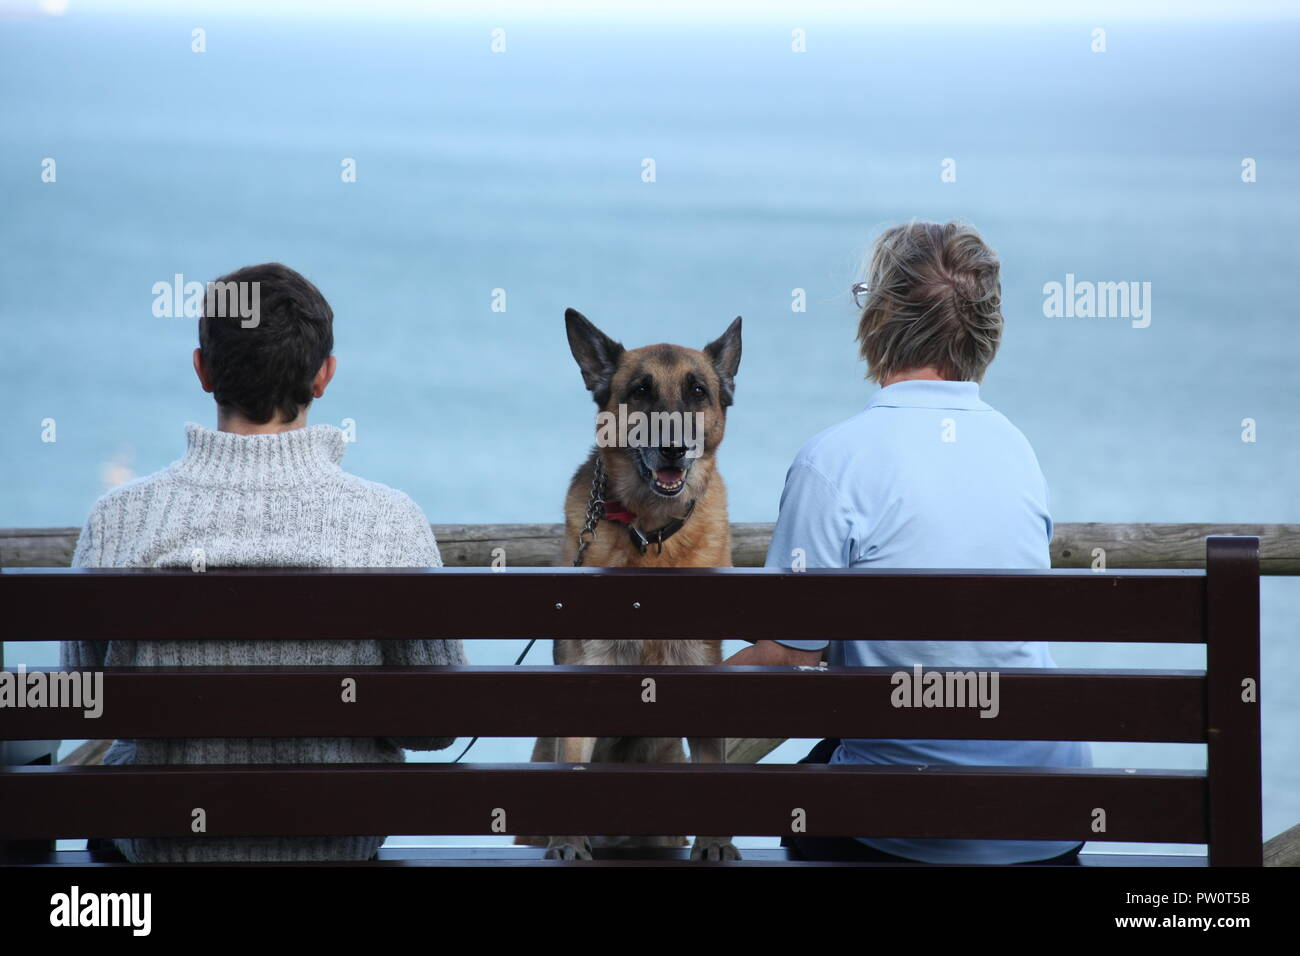 Family pet - German Shepherd - Stock Image